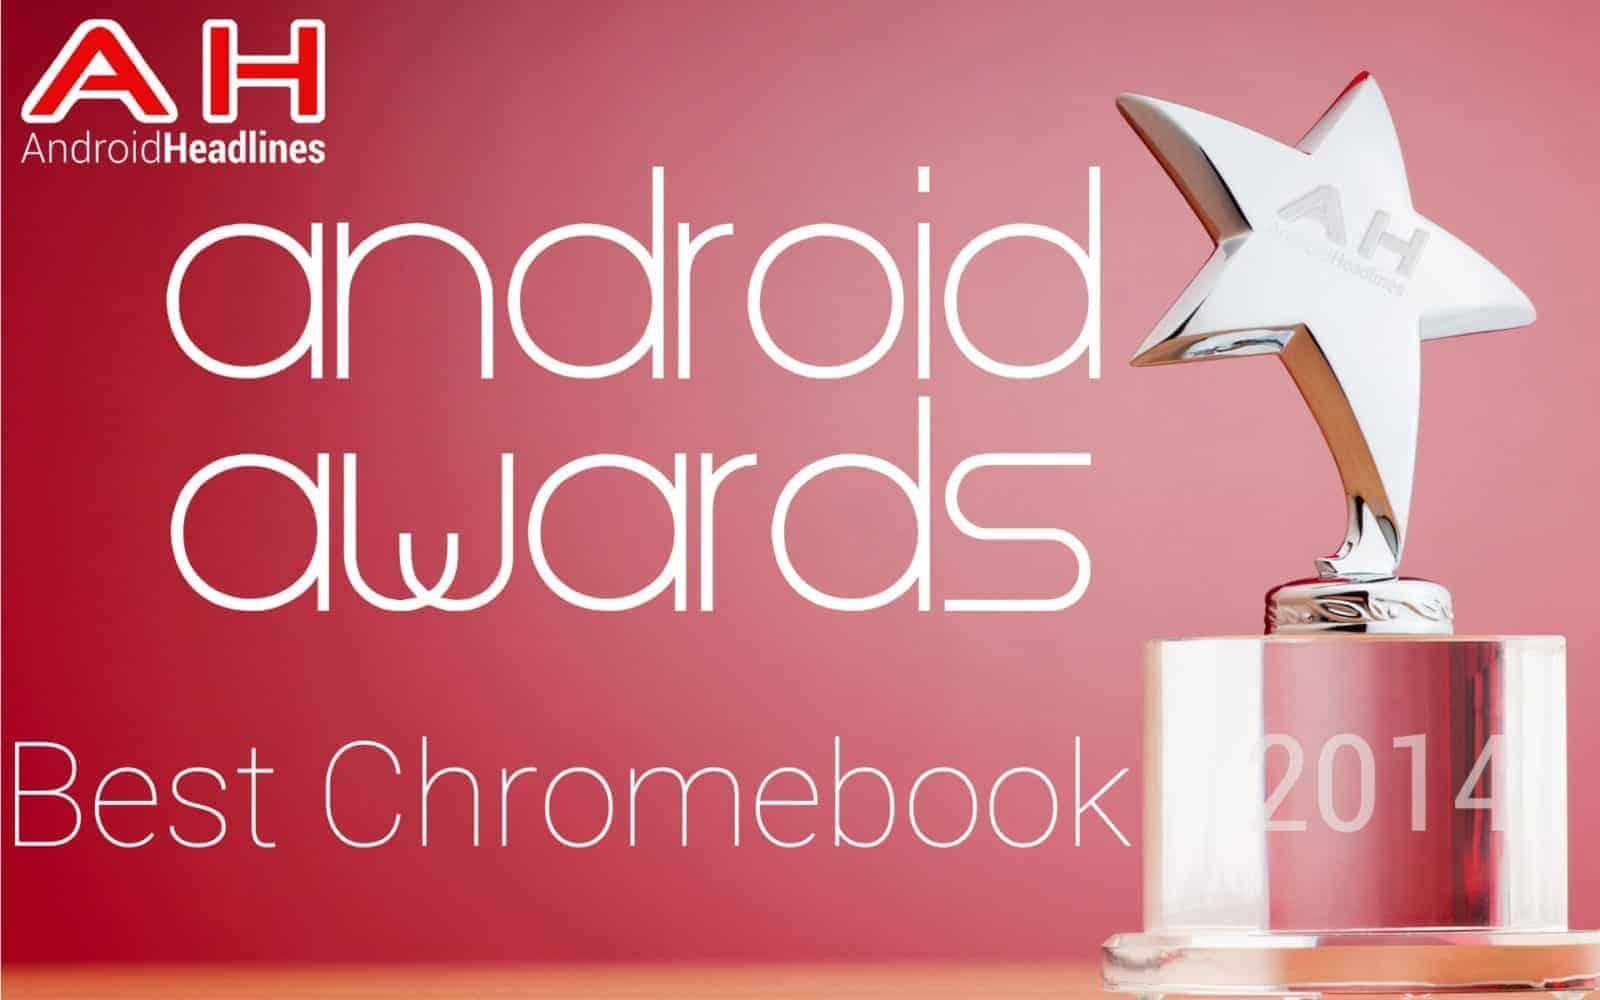 AH Awards 2014 - Best Google Chromebook of the year